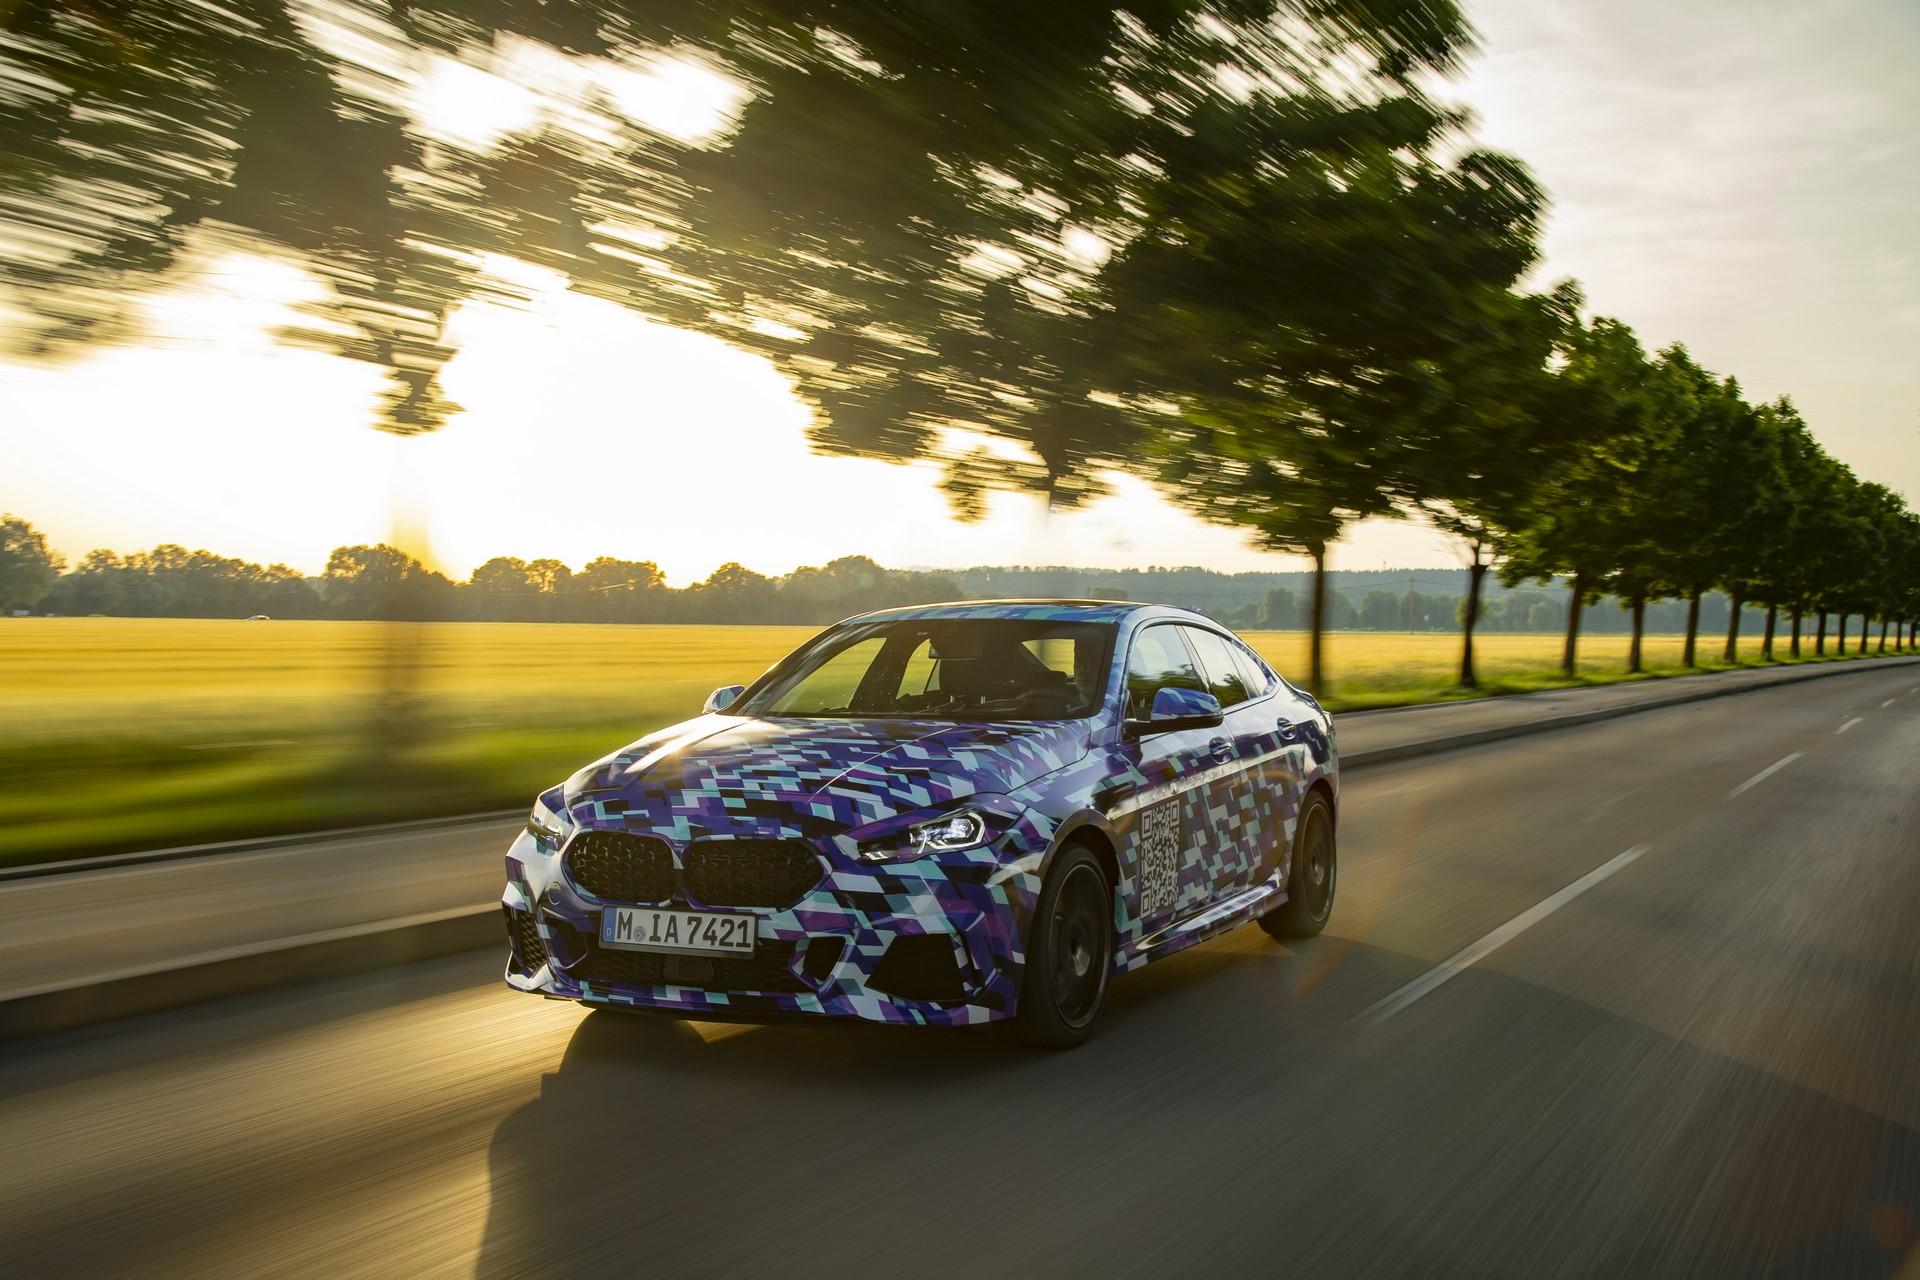 BMW-2-Series-Gran-Coupe-2020-spy-photos-34